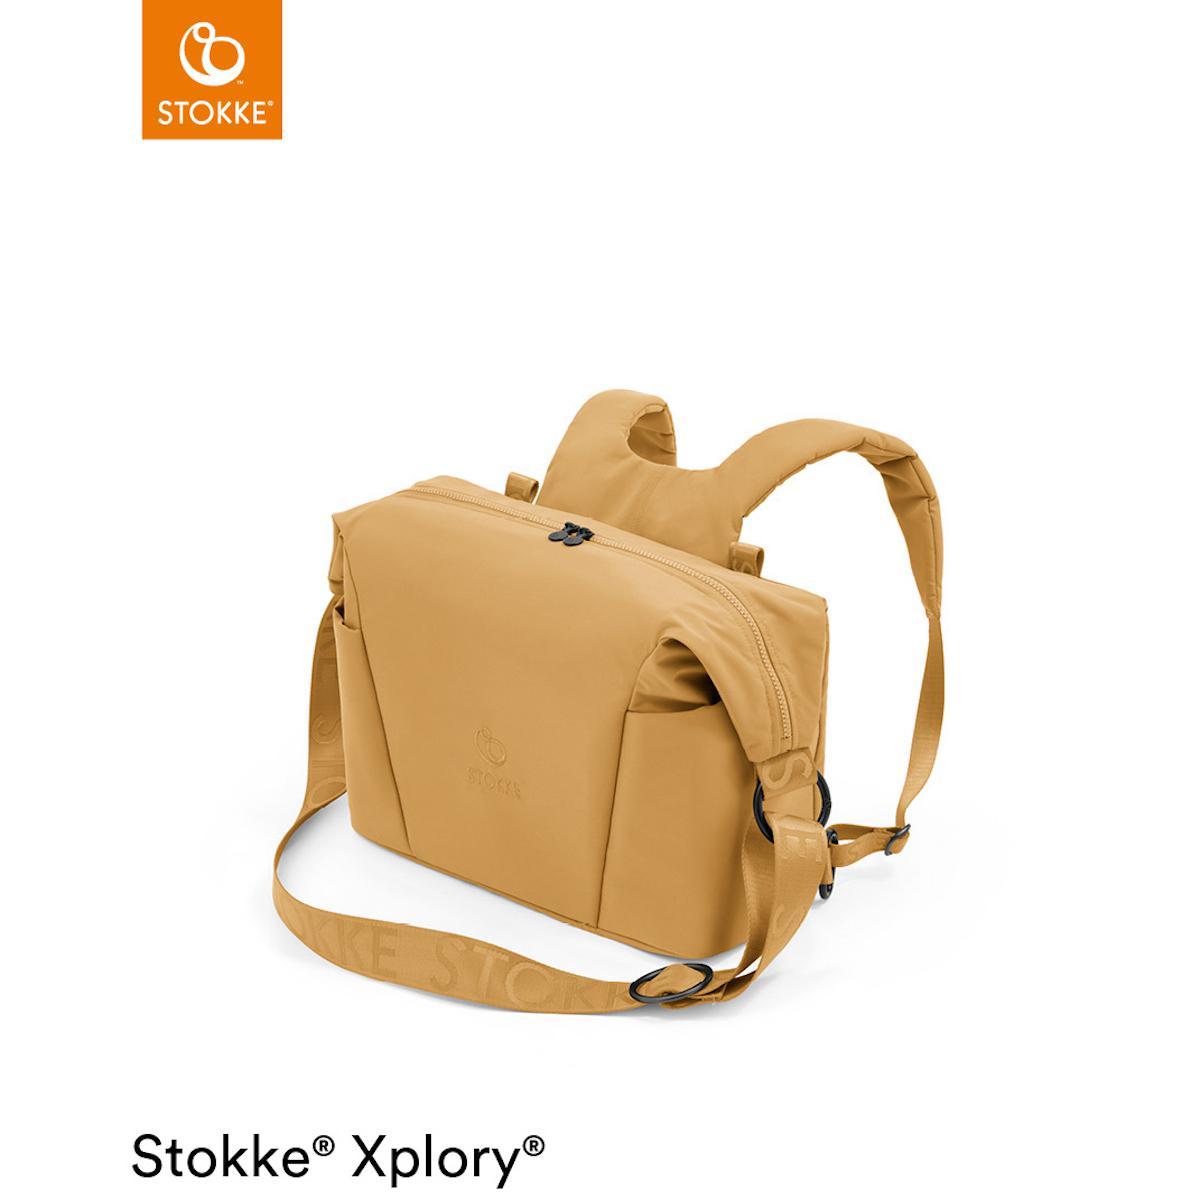 Sac à langer XPLORY X Stokke Golden Yellow